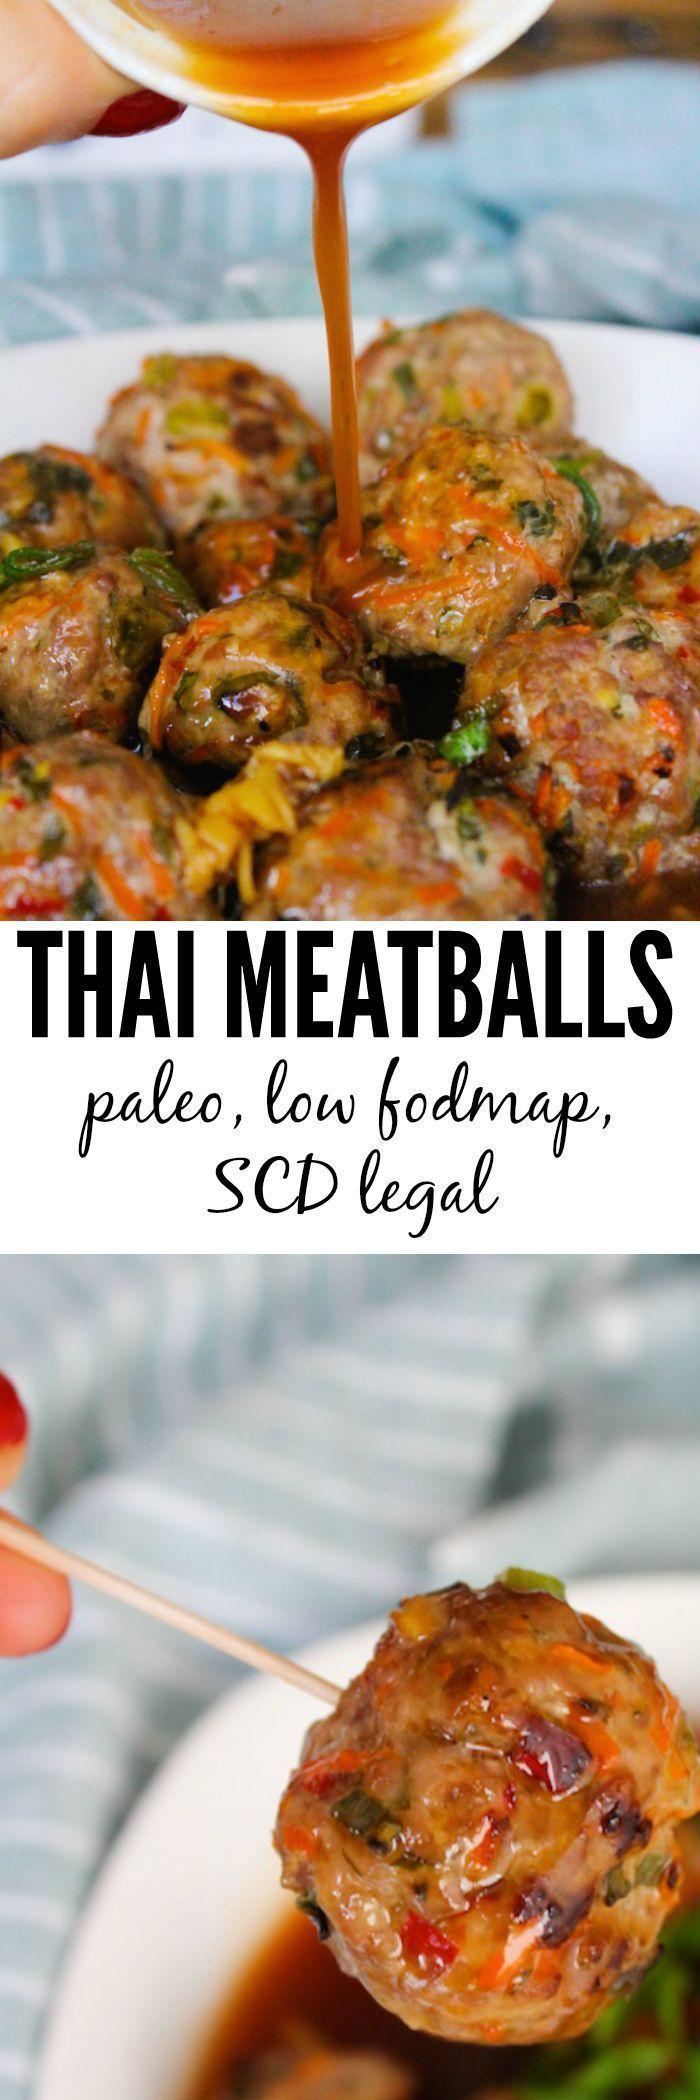 Paleo, Low FODMAP, SCD Legal Thai Meatballs http://www.asaucykitchen.com http://www.asaucykitchen.comthai-meatballs-paleo-low-fodmap/?utm_content=buffer878f5&utm_medium=social&utm_source=pinterest.com&utm_campaign=buffer